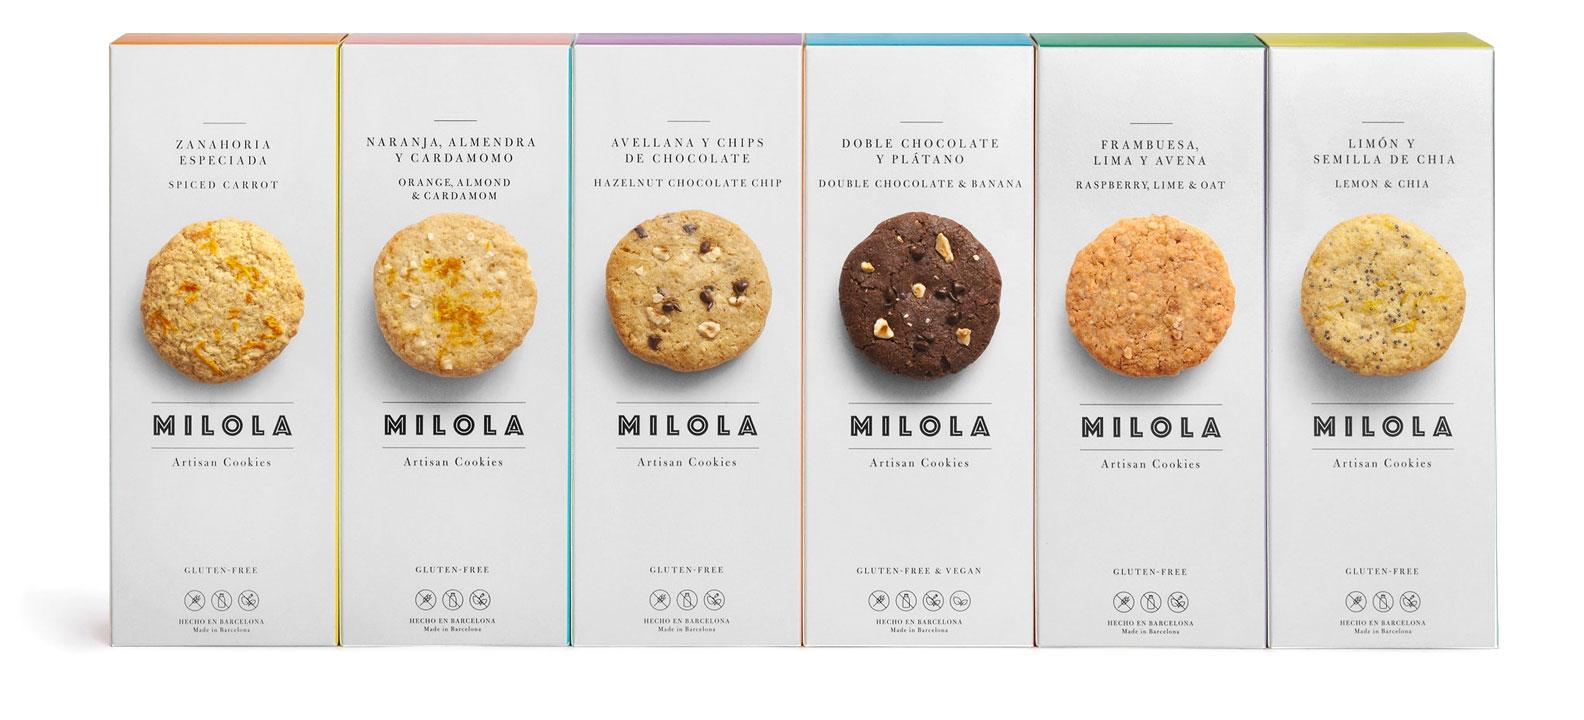 milola gluten-free cookies six flavours